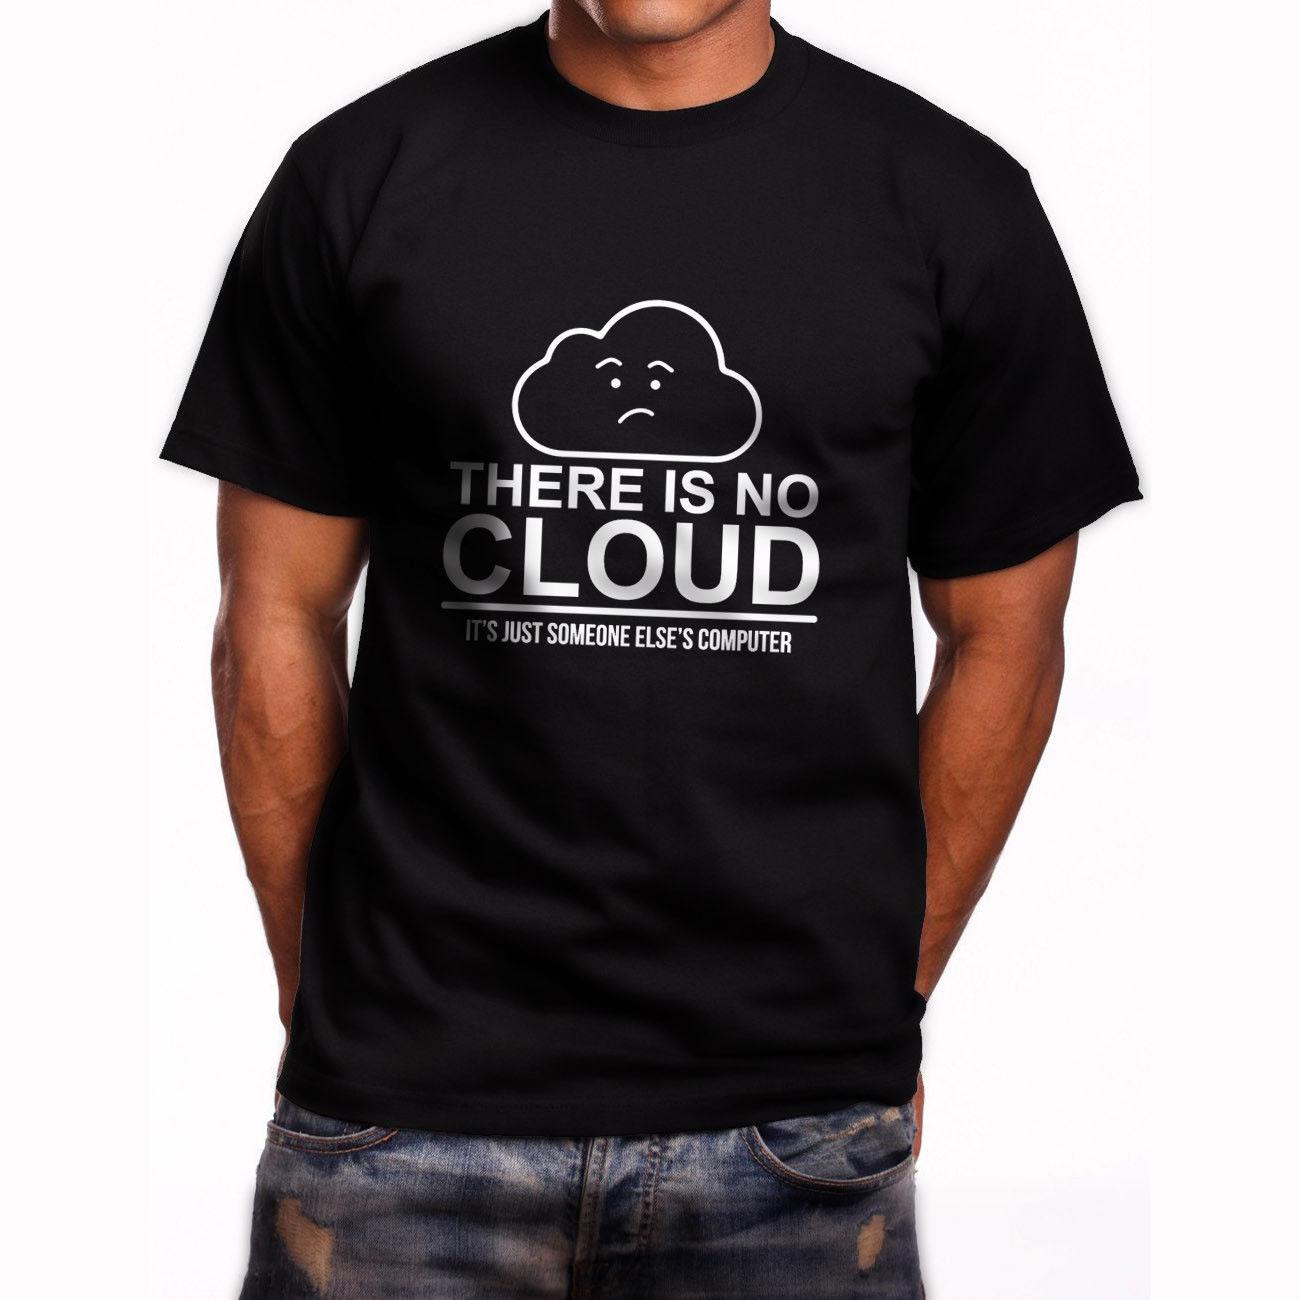 No Cloud Just Someone Elses Computer Short Sleeve Mens Black T-Shirt S-3XL Fashion Summer Paried T Shirt Top Tee